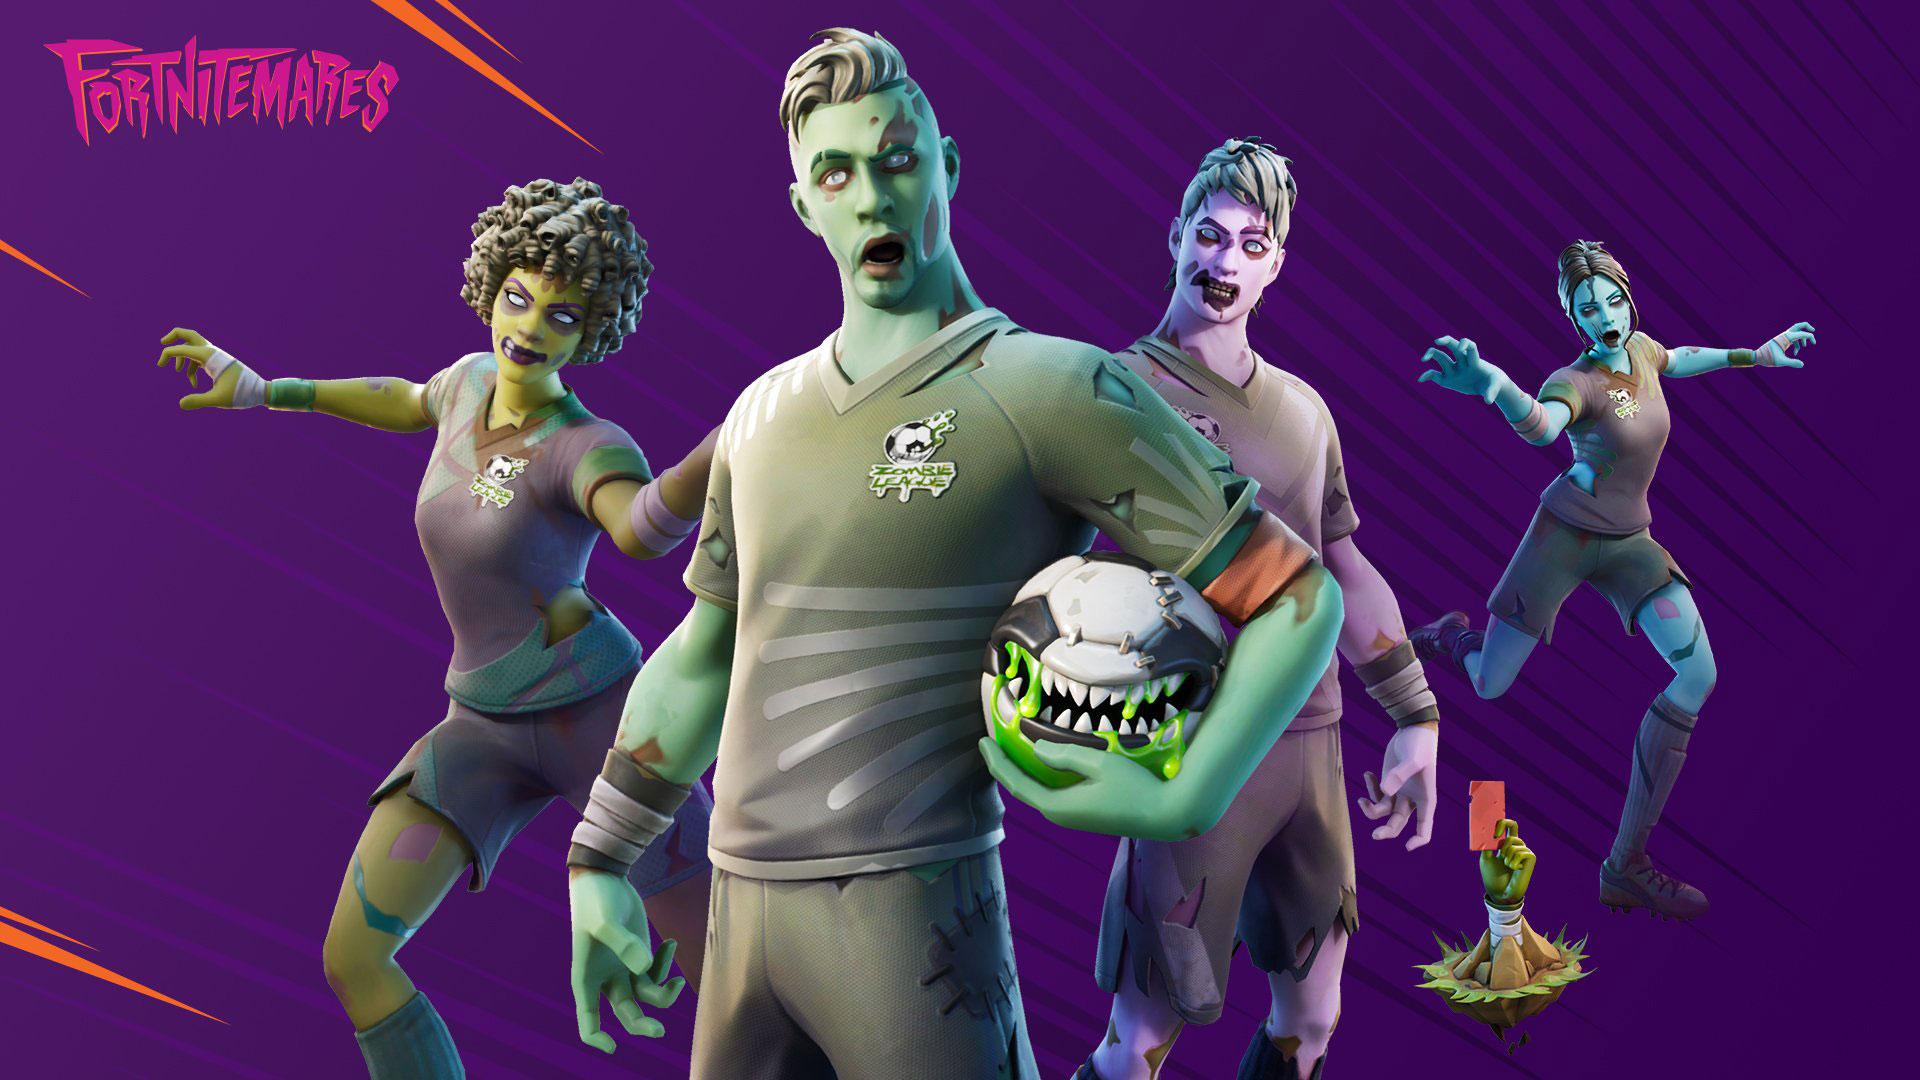 Fortnitemares Halloween 2019 Release Date Skins Leaks Pro Game Guides